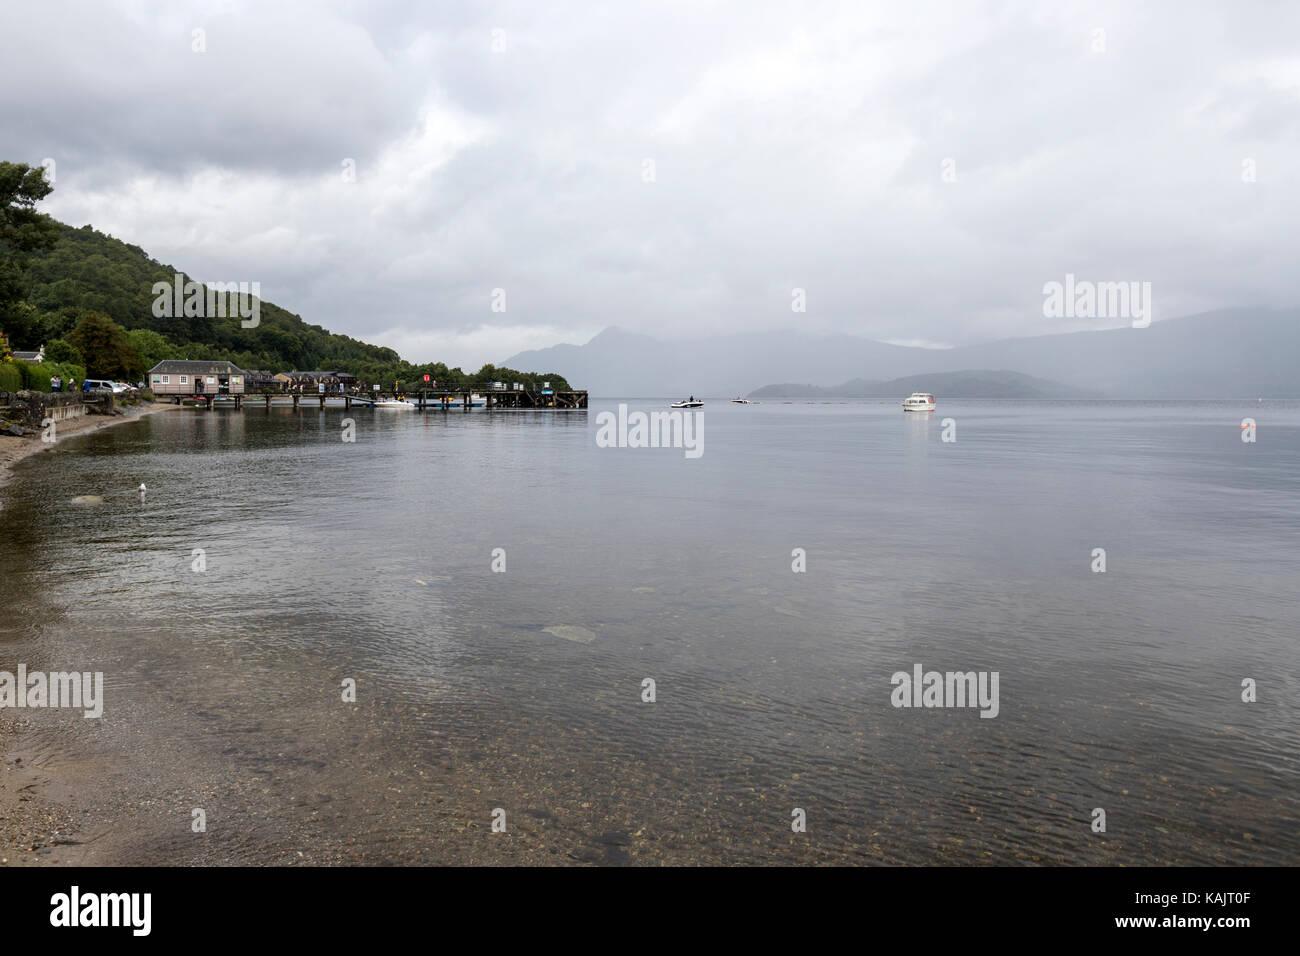 Luss, on the west bank of Loch Lomond., Argyll & Bute, Scotland, UK - Stock Image